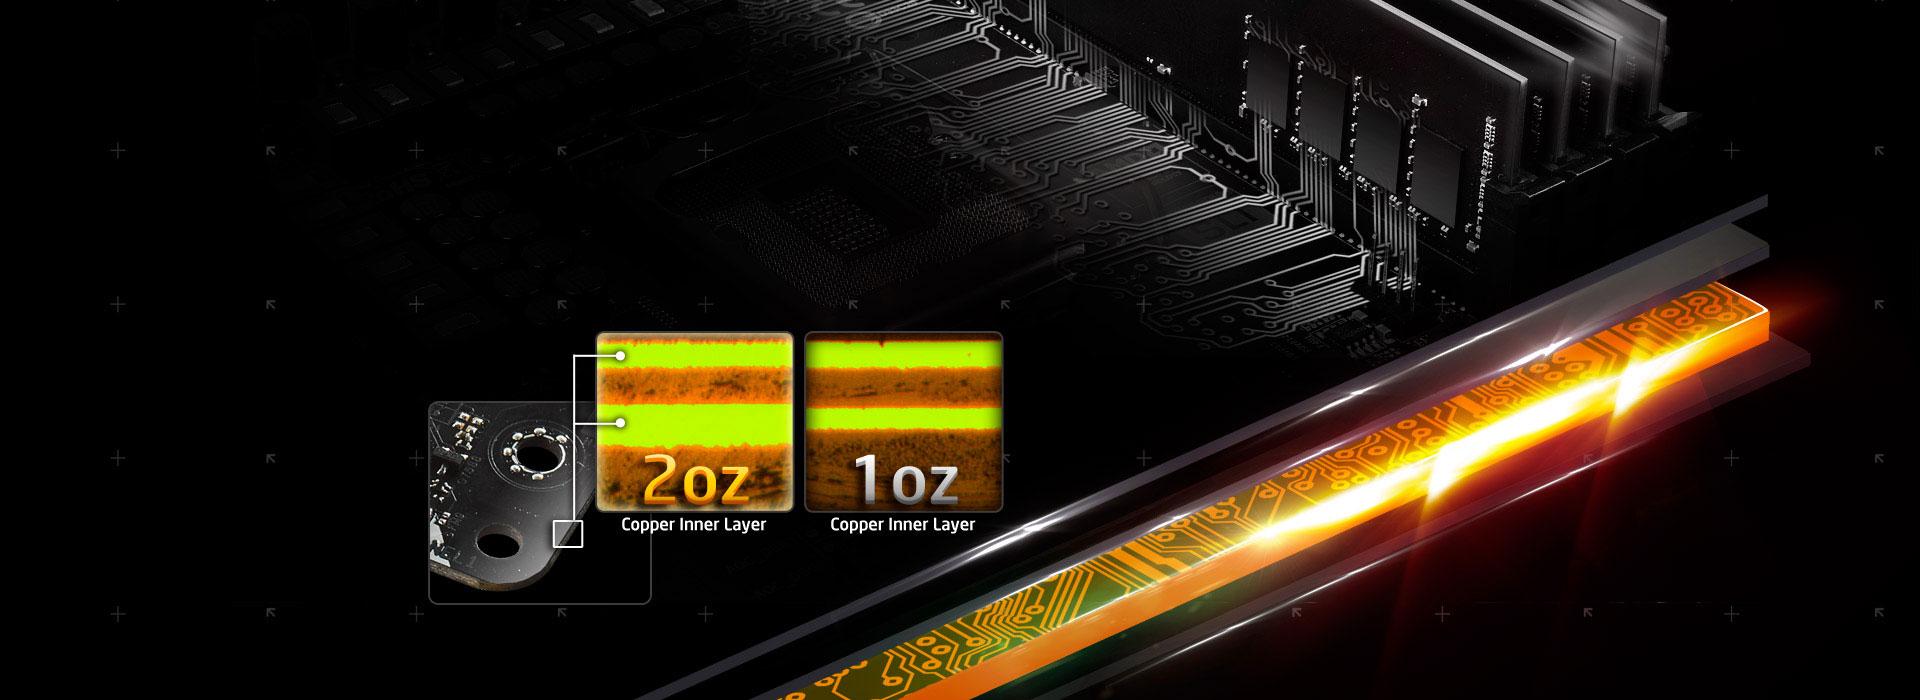 ASRock B450M PRO4 AM4 Micro ATX AMD Motherboard - Newegg ca